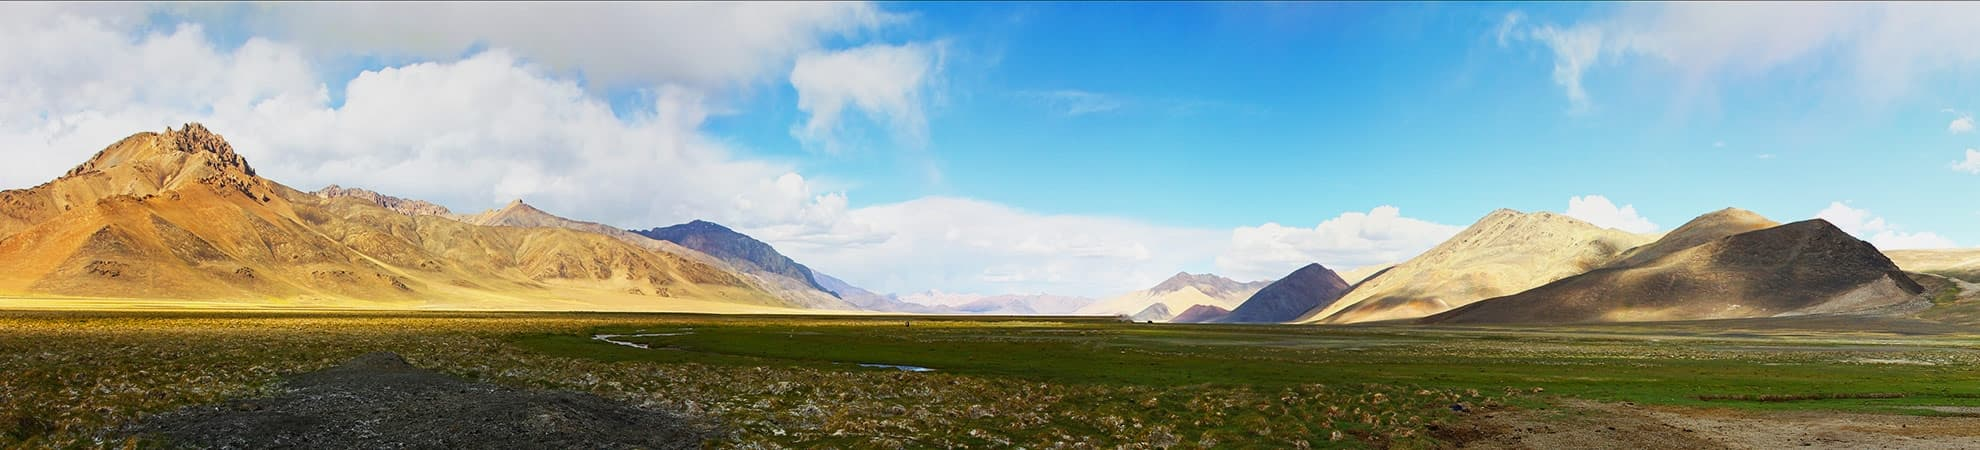 Voyage Tadjikistan